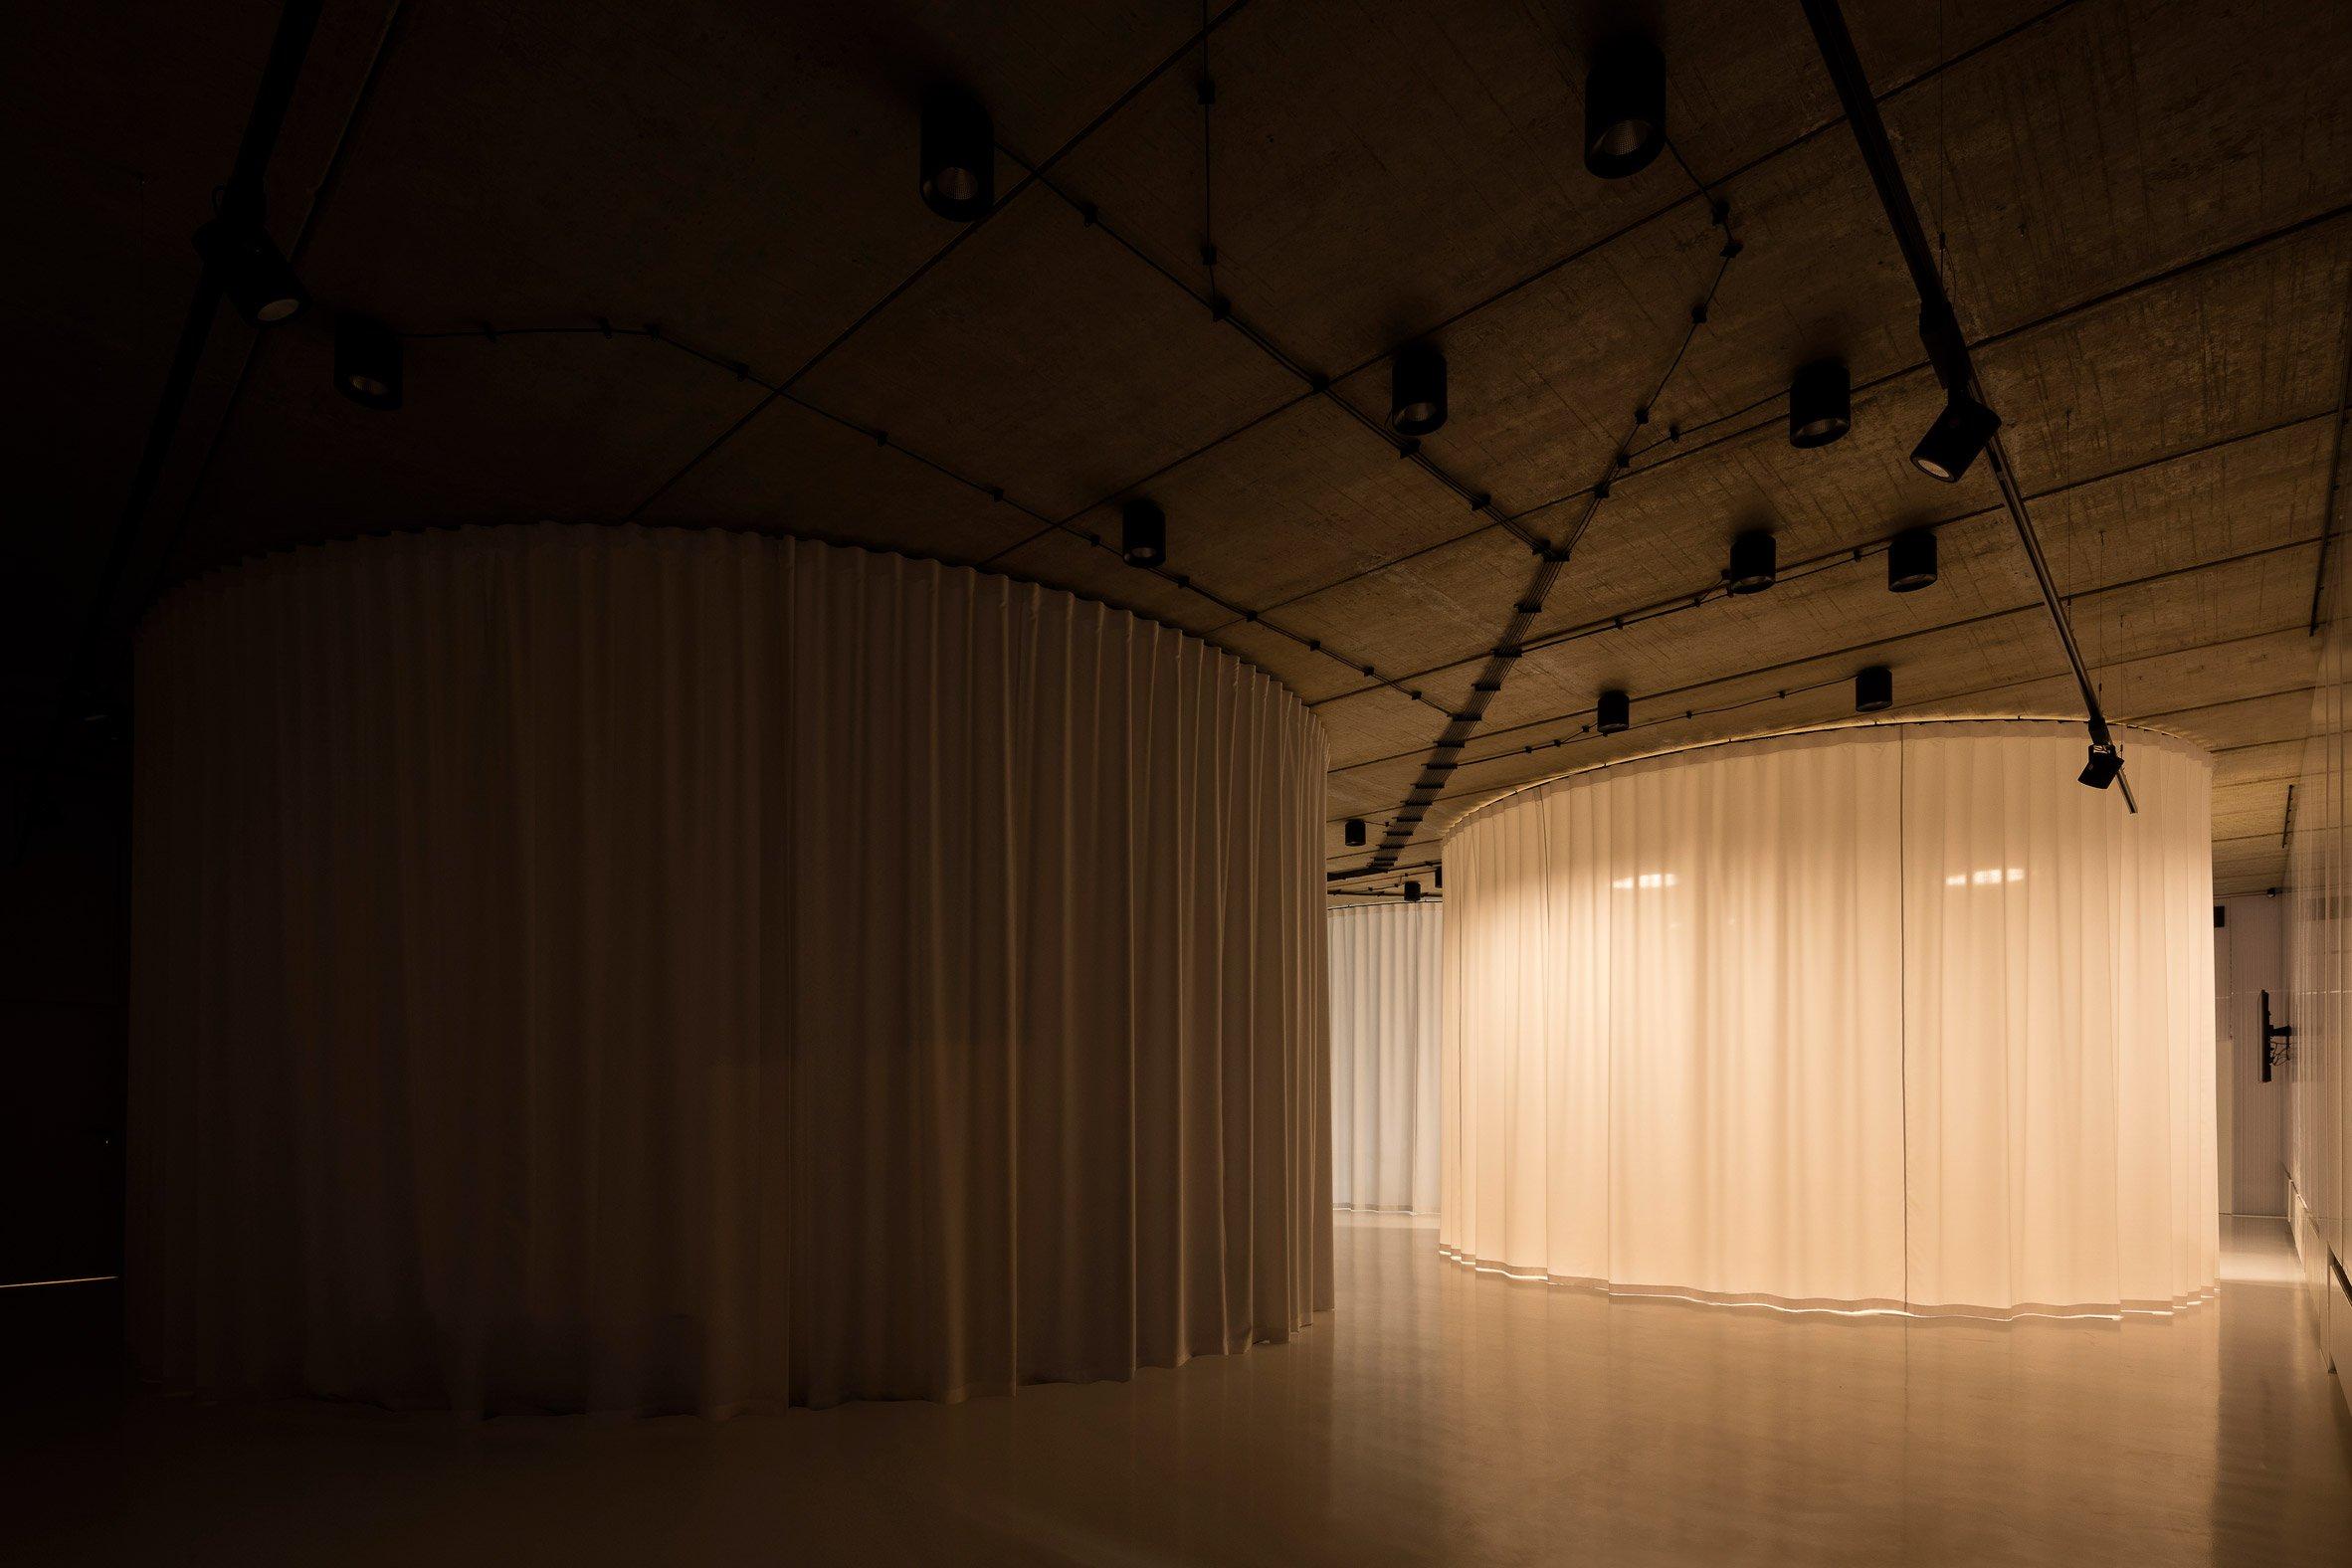 gallery-furniture-chybik-kistof-architecture-retail-czech-republic_dezeen_2364_col_9.jpg